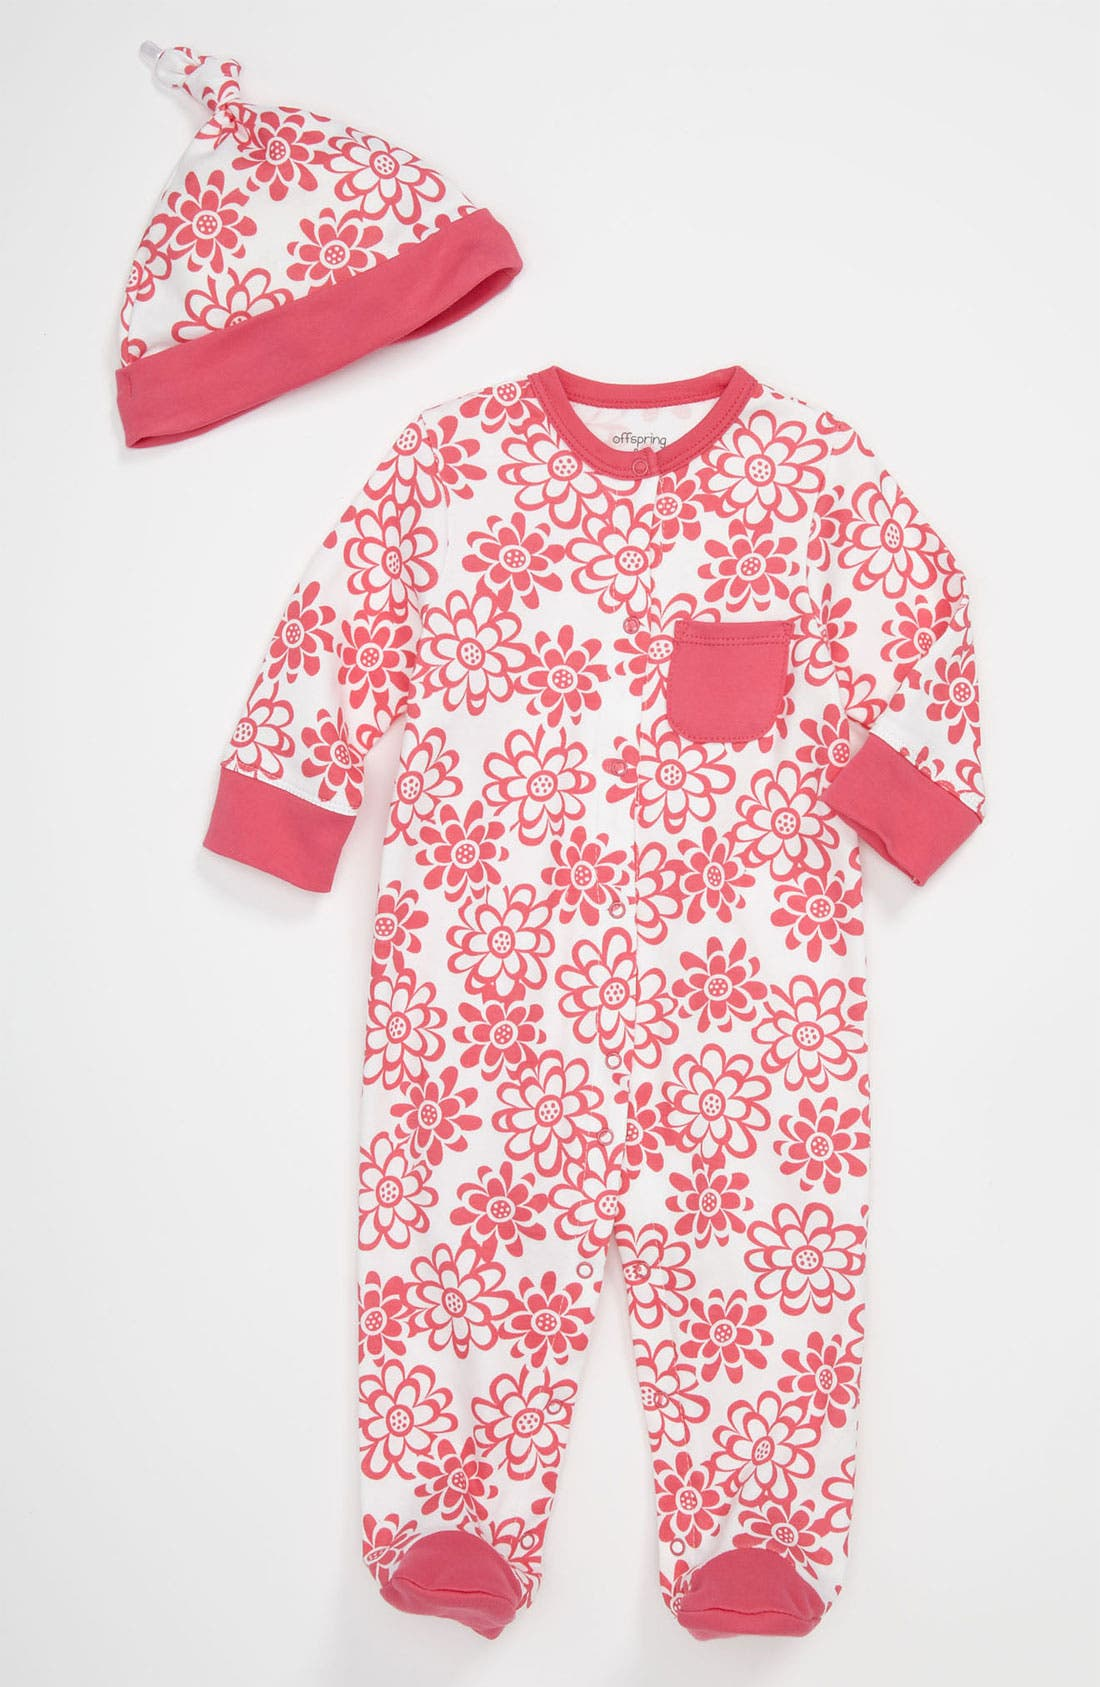 Alternate Image 1 Selected - Offspring 'Flower' Footie & Hat (Baby)